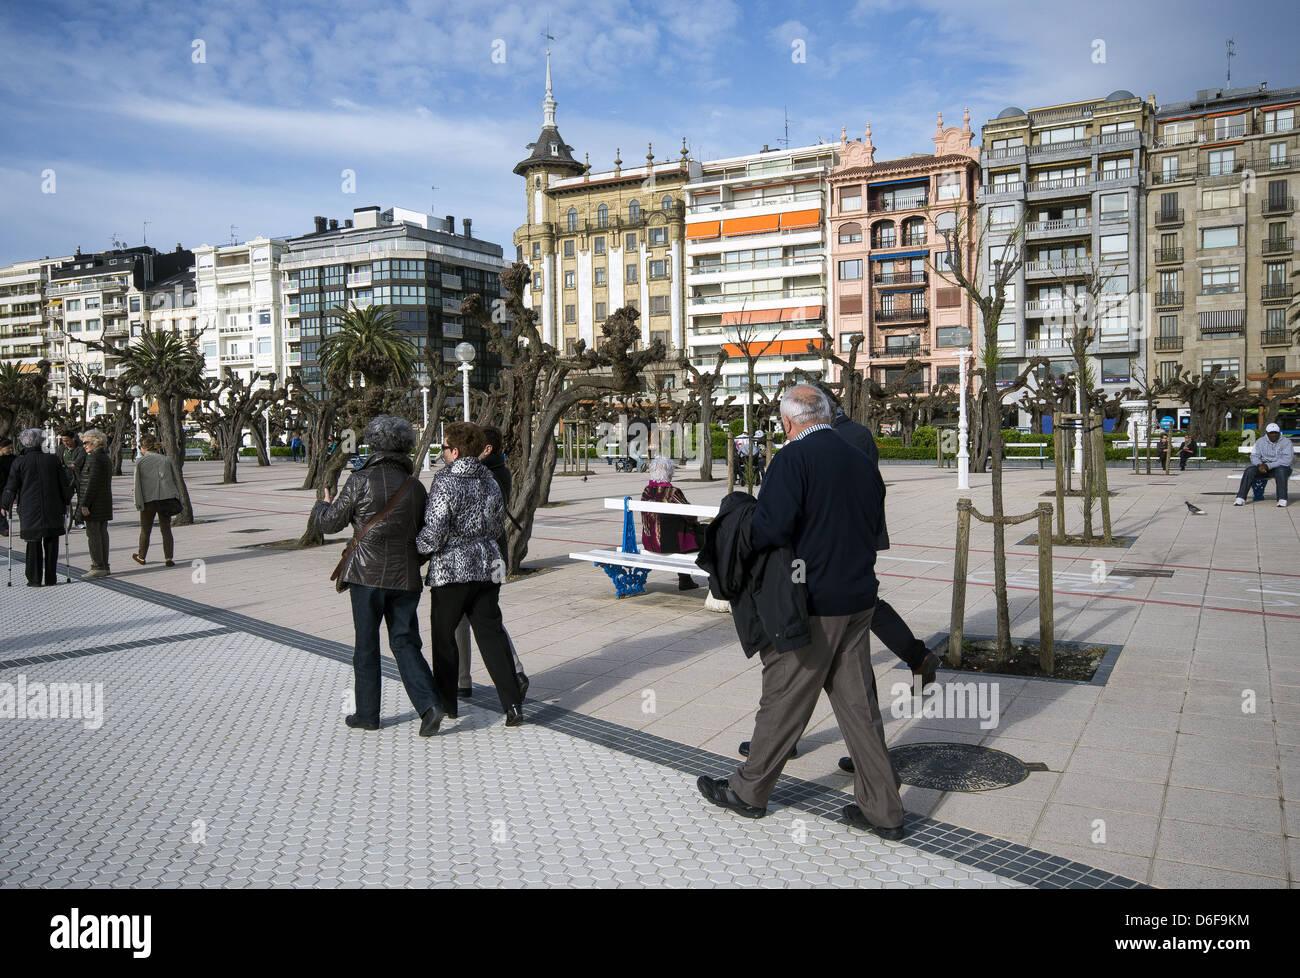 Tourist walking along the seafront in San Sebastián, Donostia, Basque Country, Spain - Stock Image